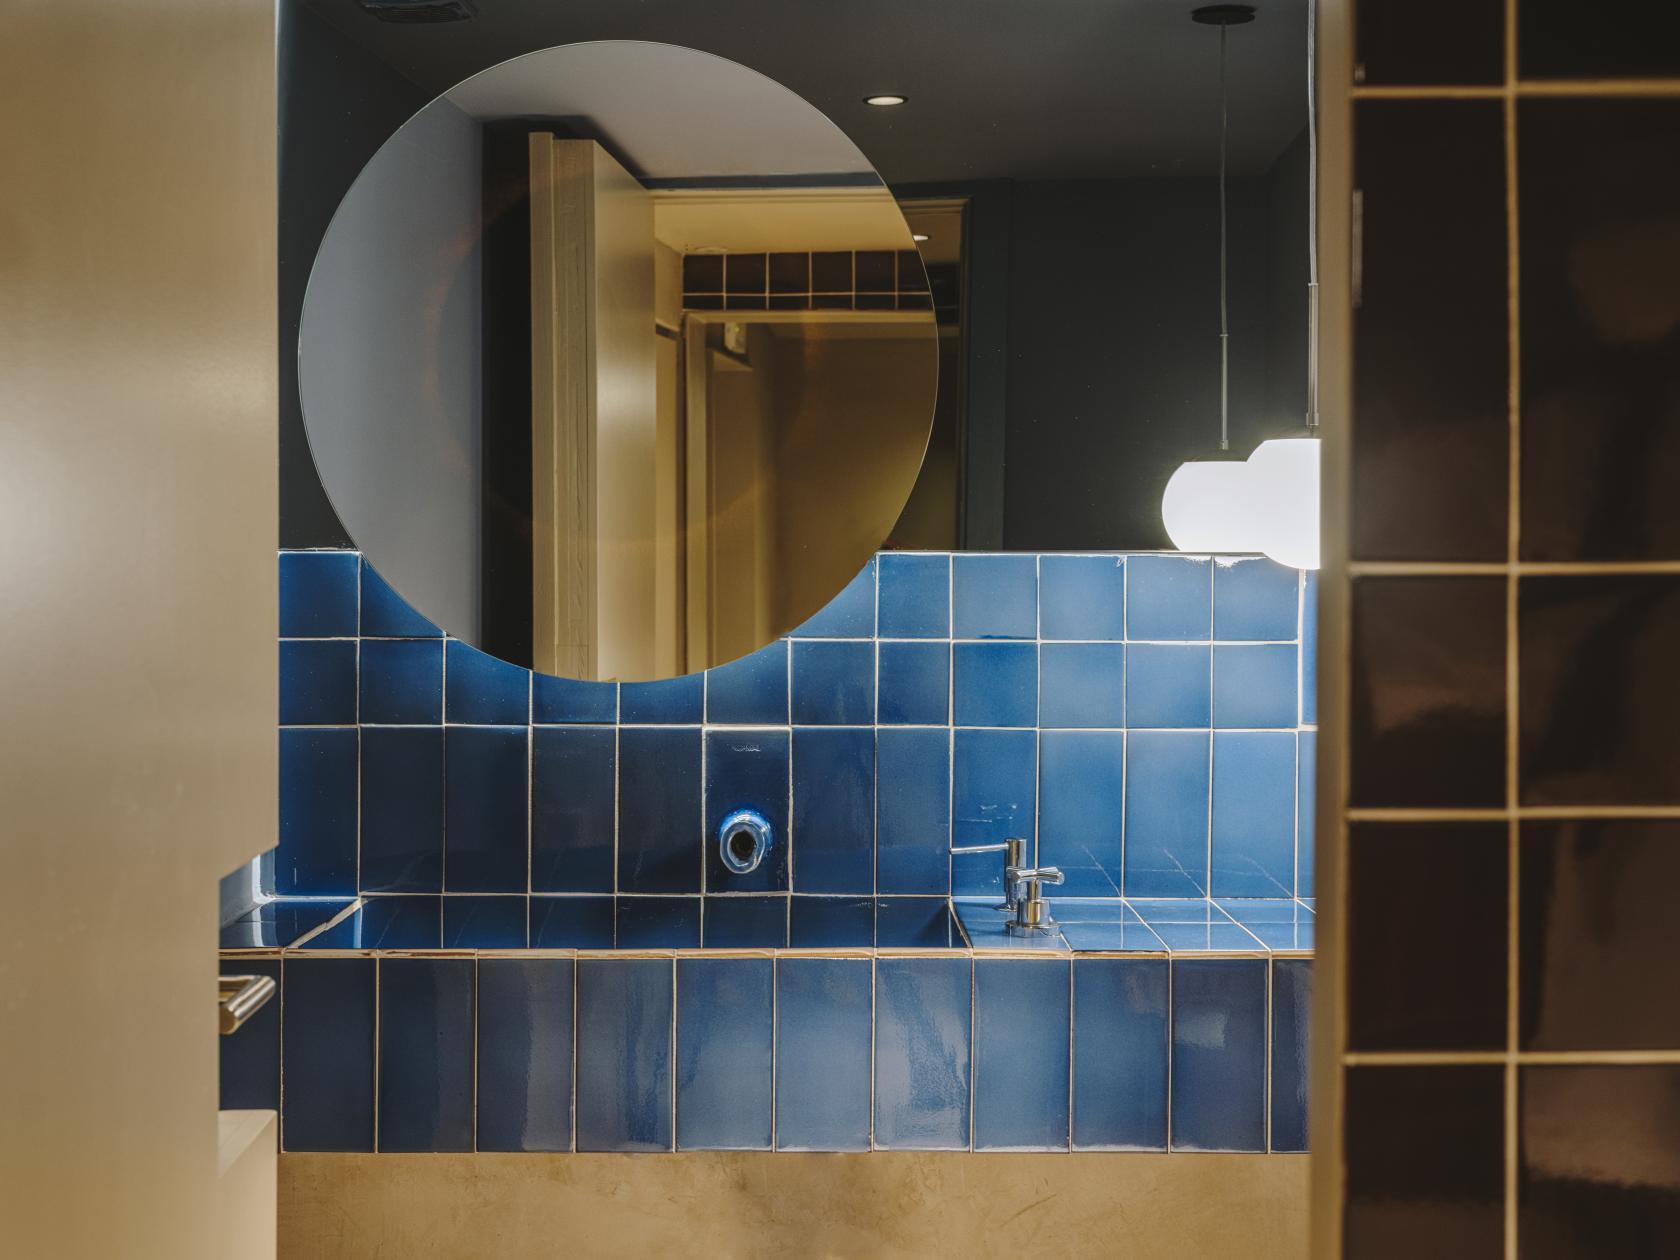 Glazed tiles in the bathrooms